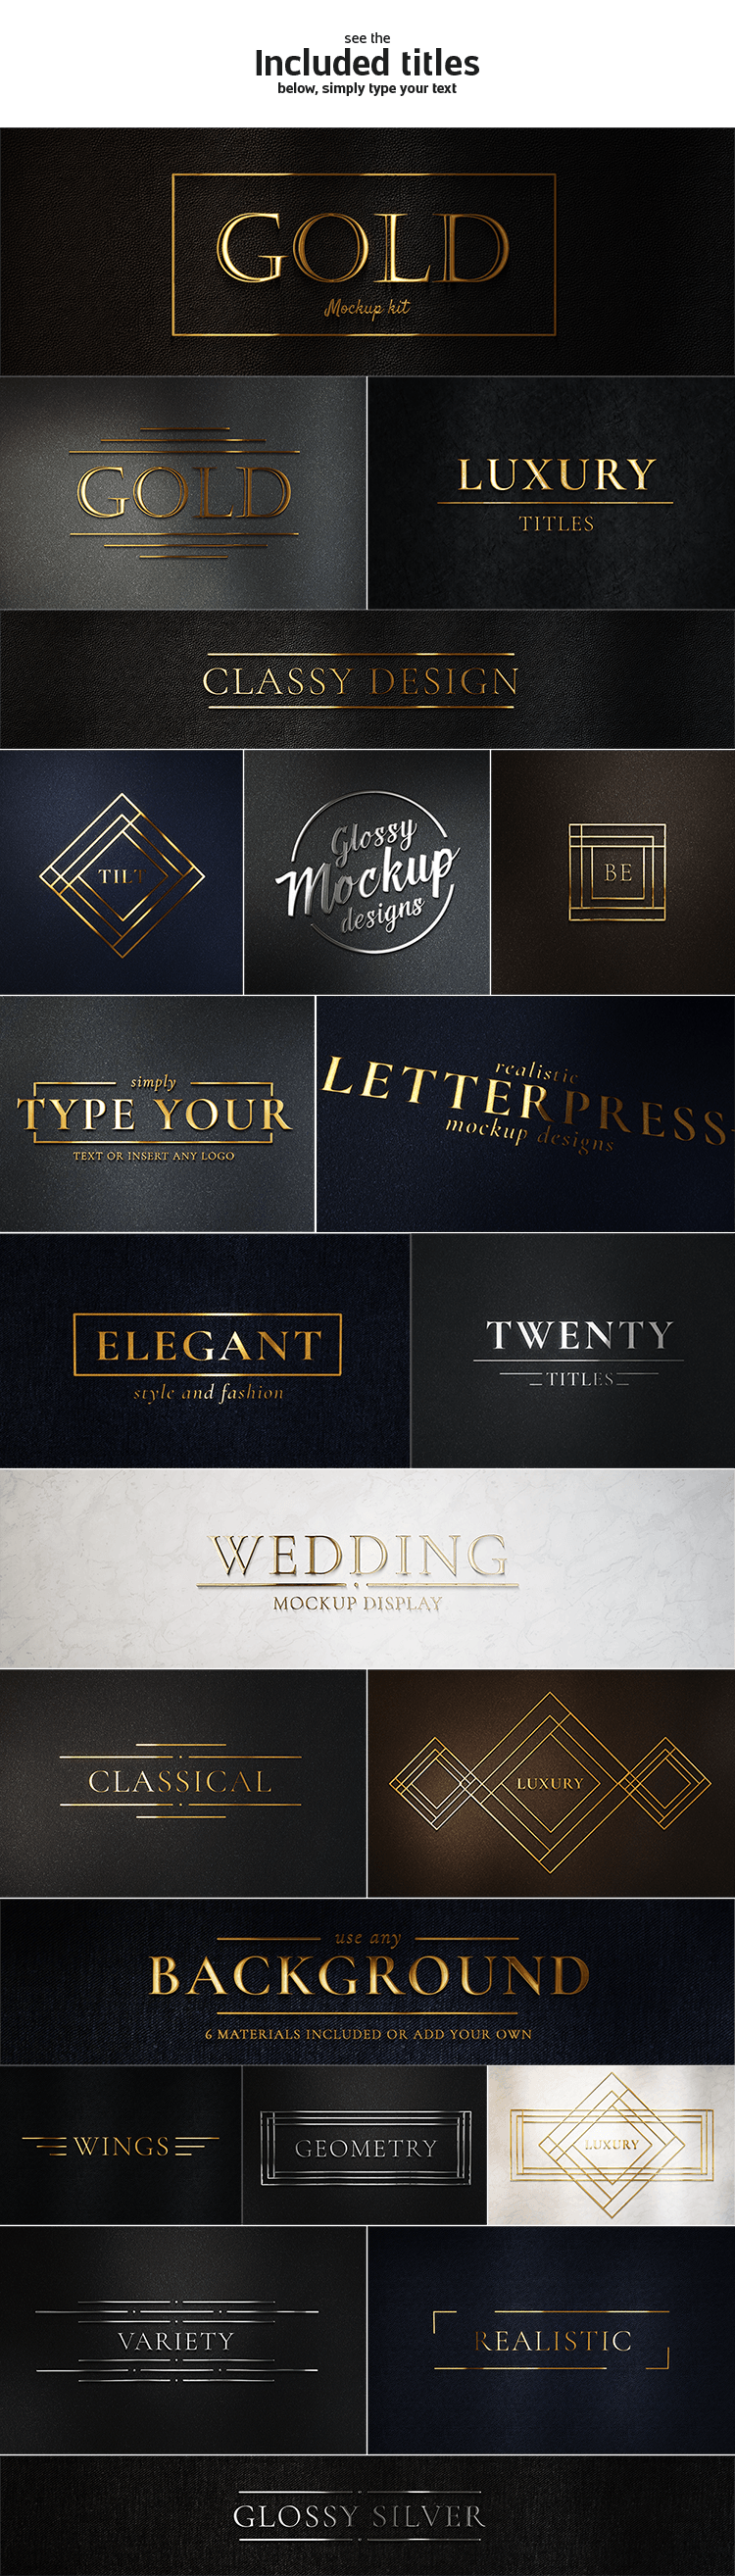 Gold Glossy Logo & Titles Kit